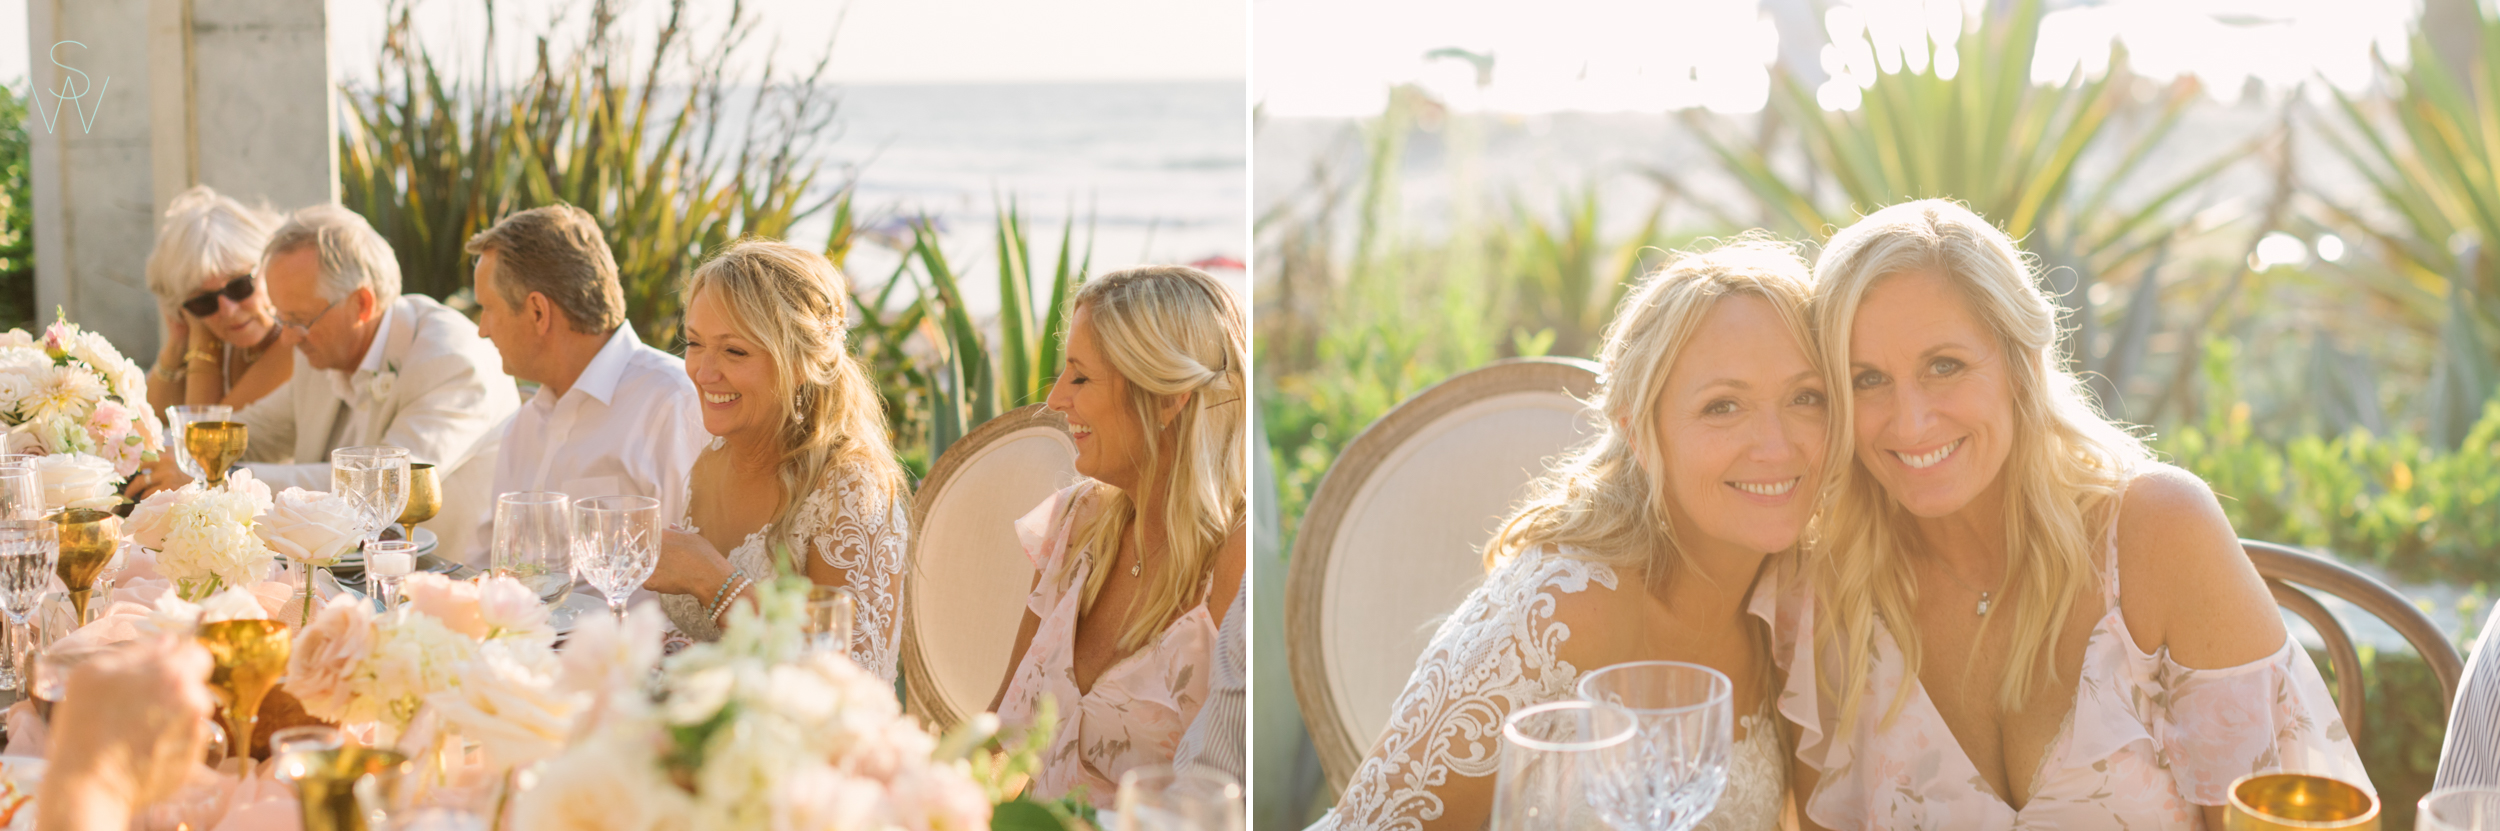 153DEL.MAR.WEDDINGS.photography.shewanders.JPG